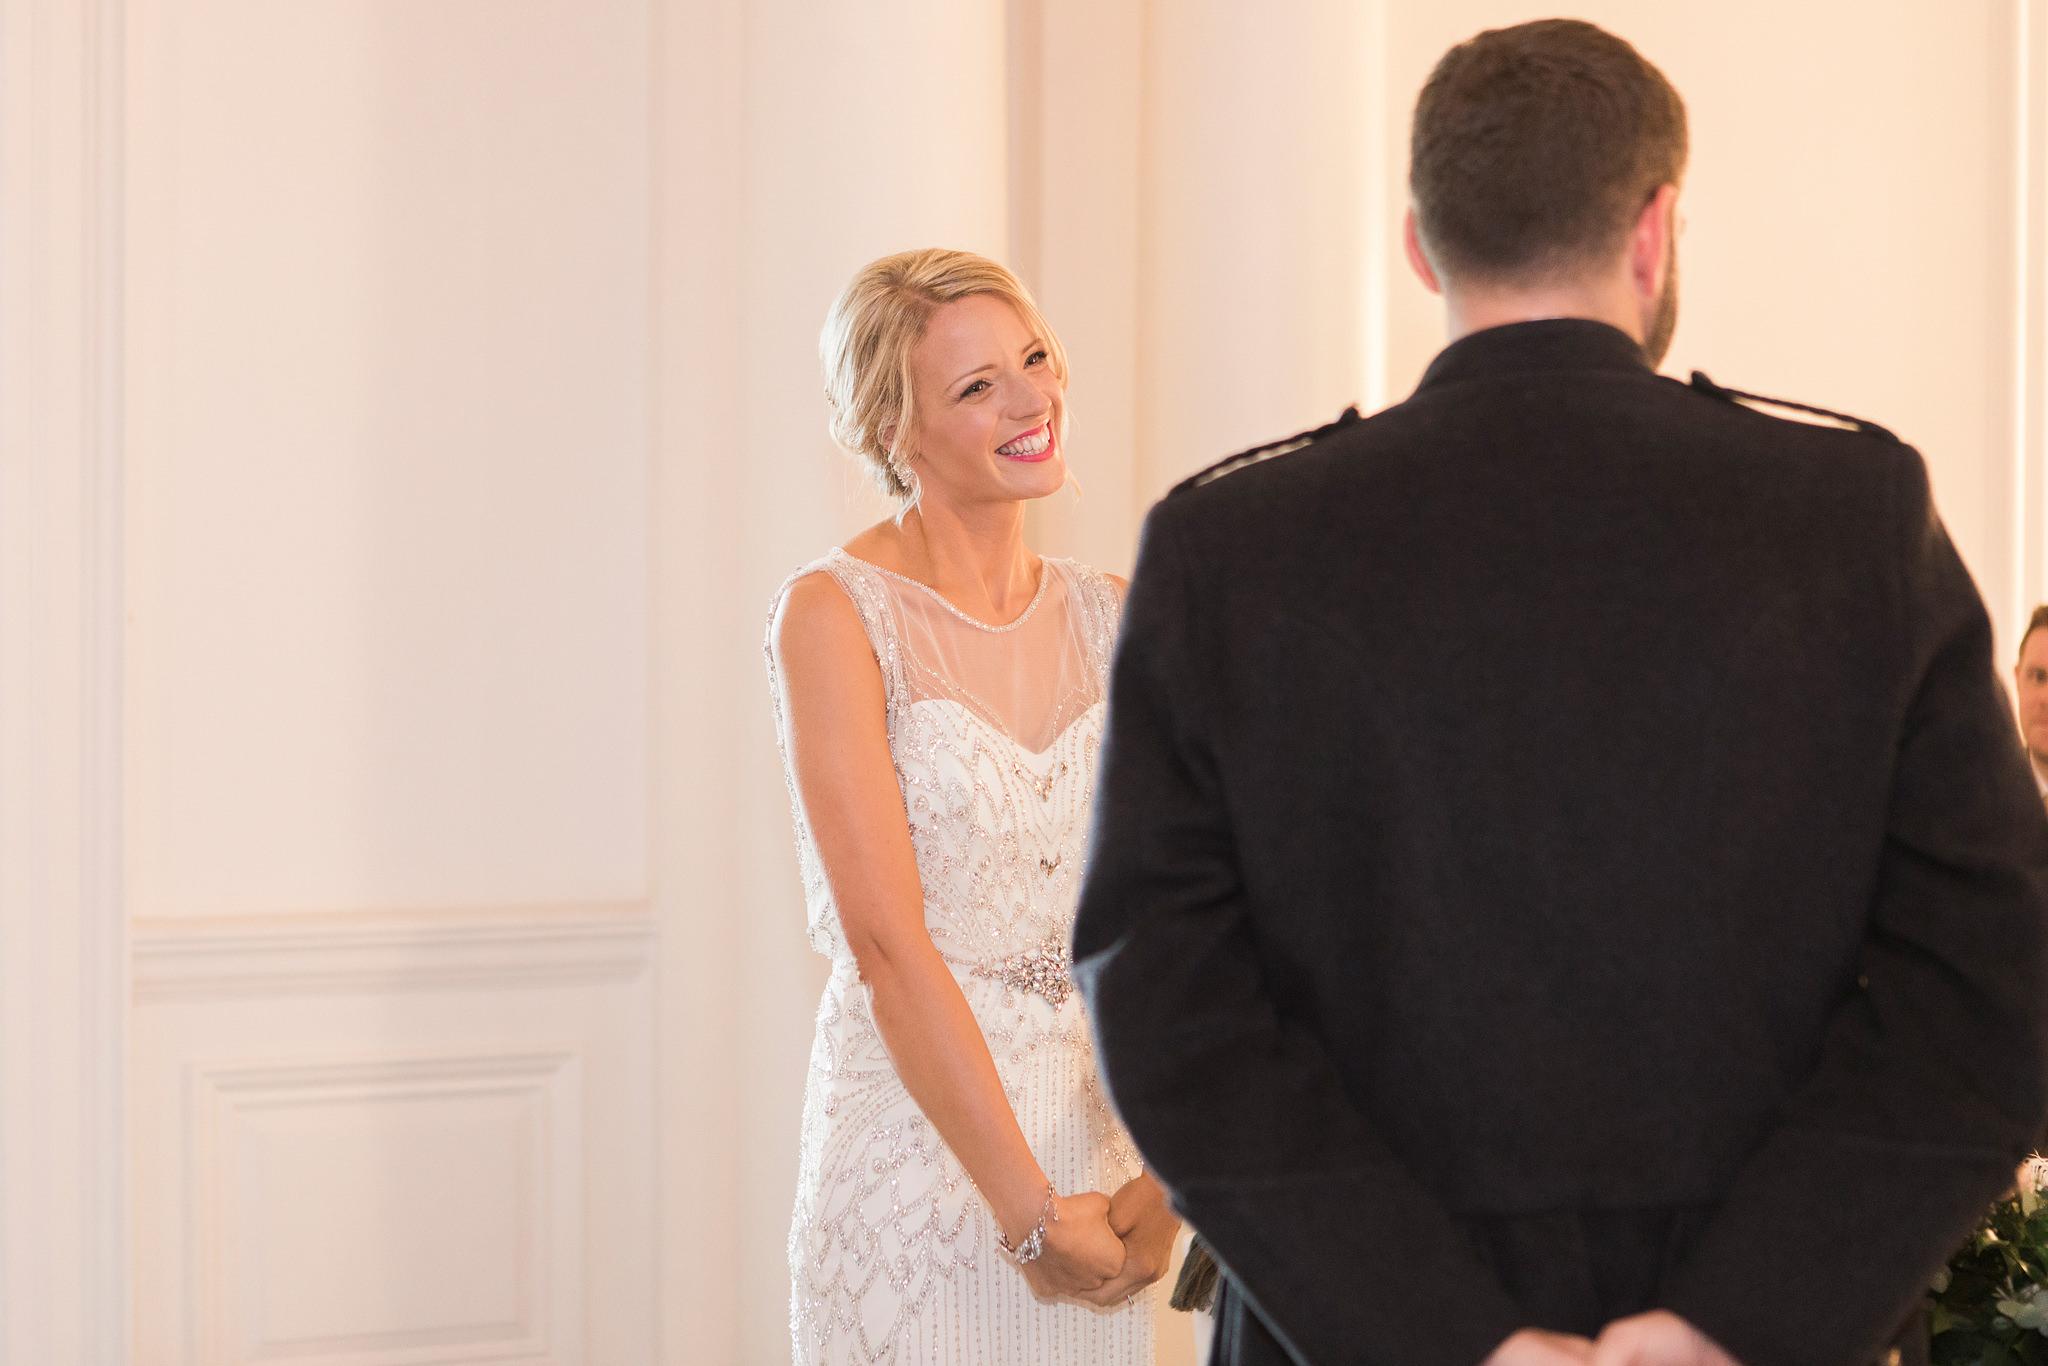 071-wedding-photography-peebles.jpg